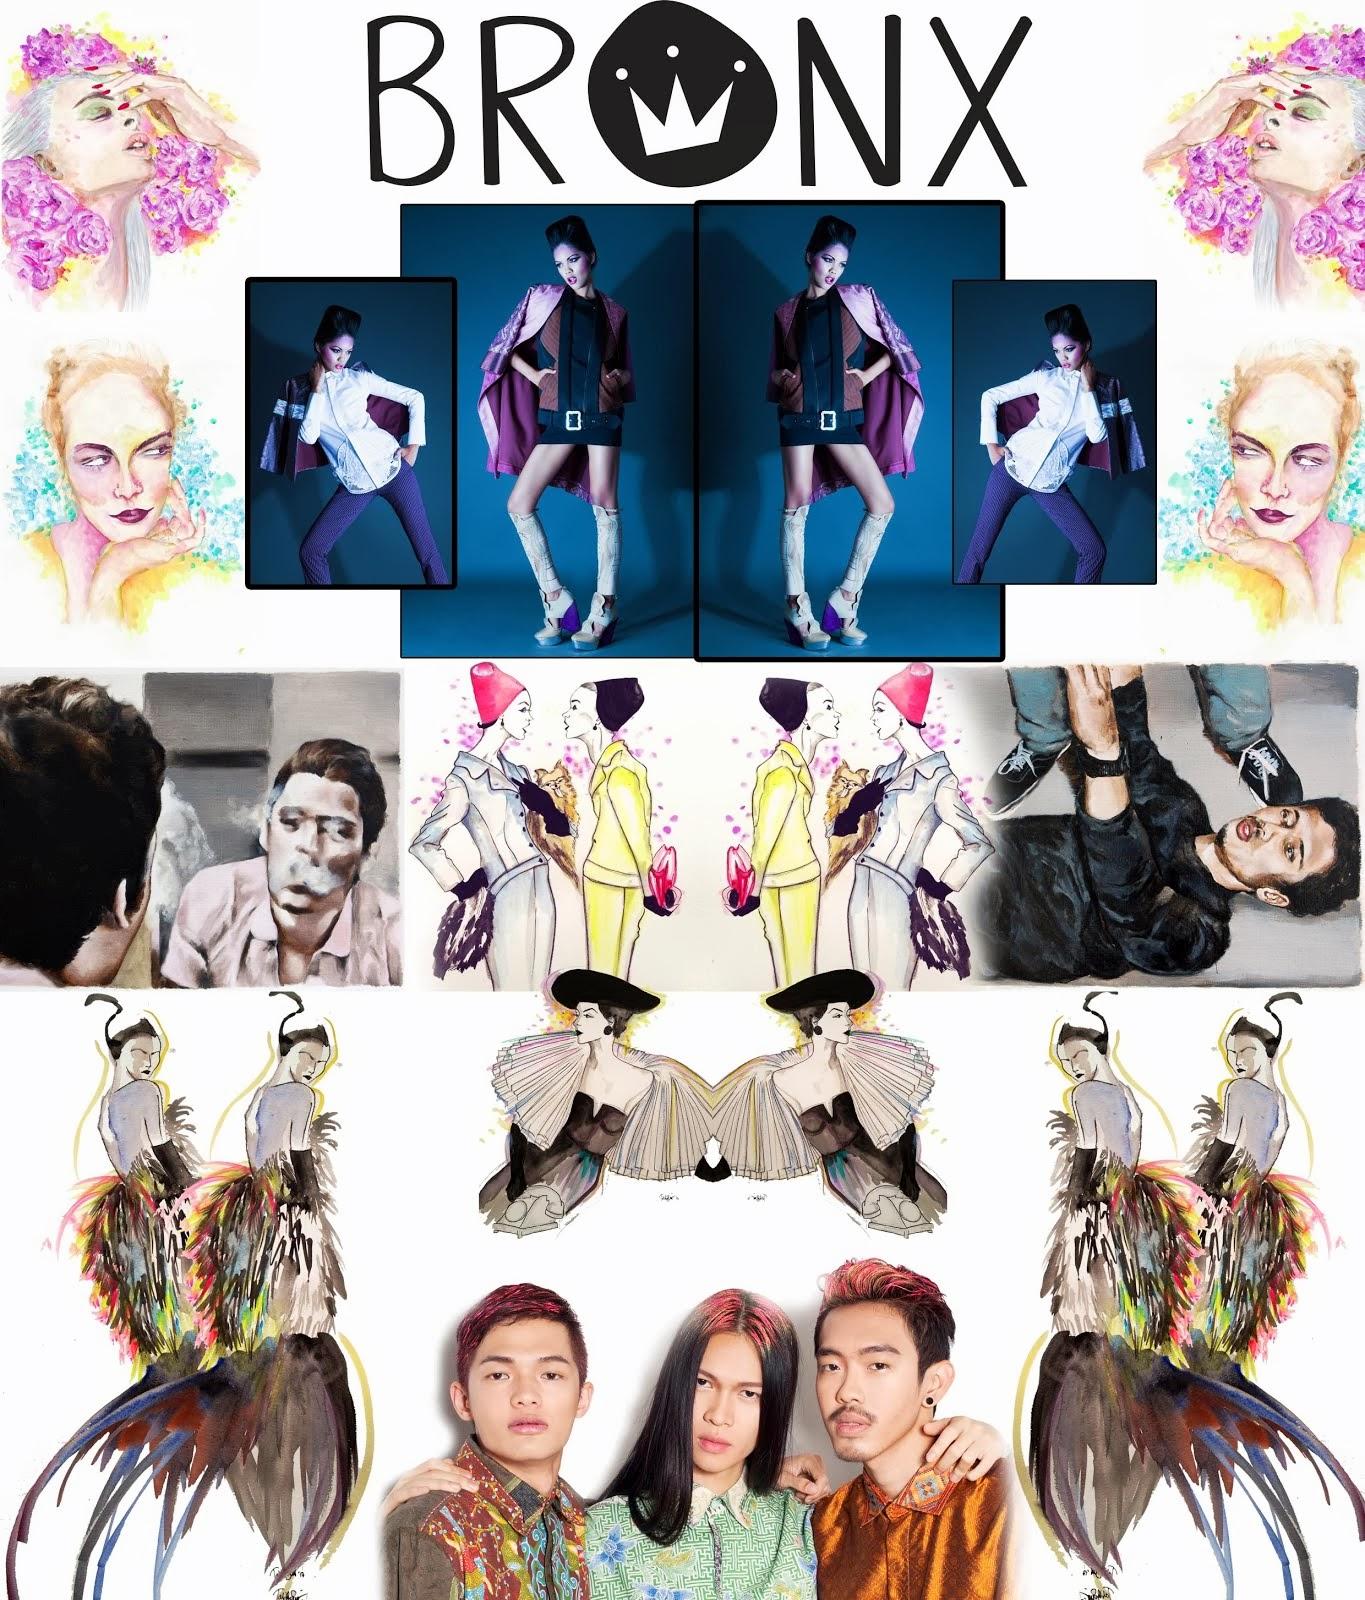 BRONX Magazine